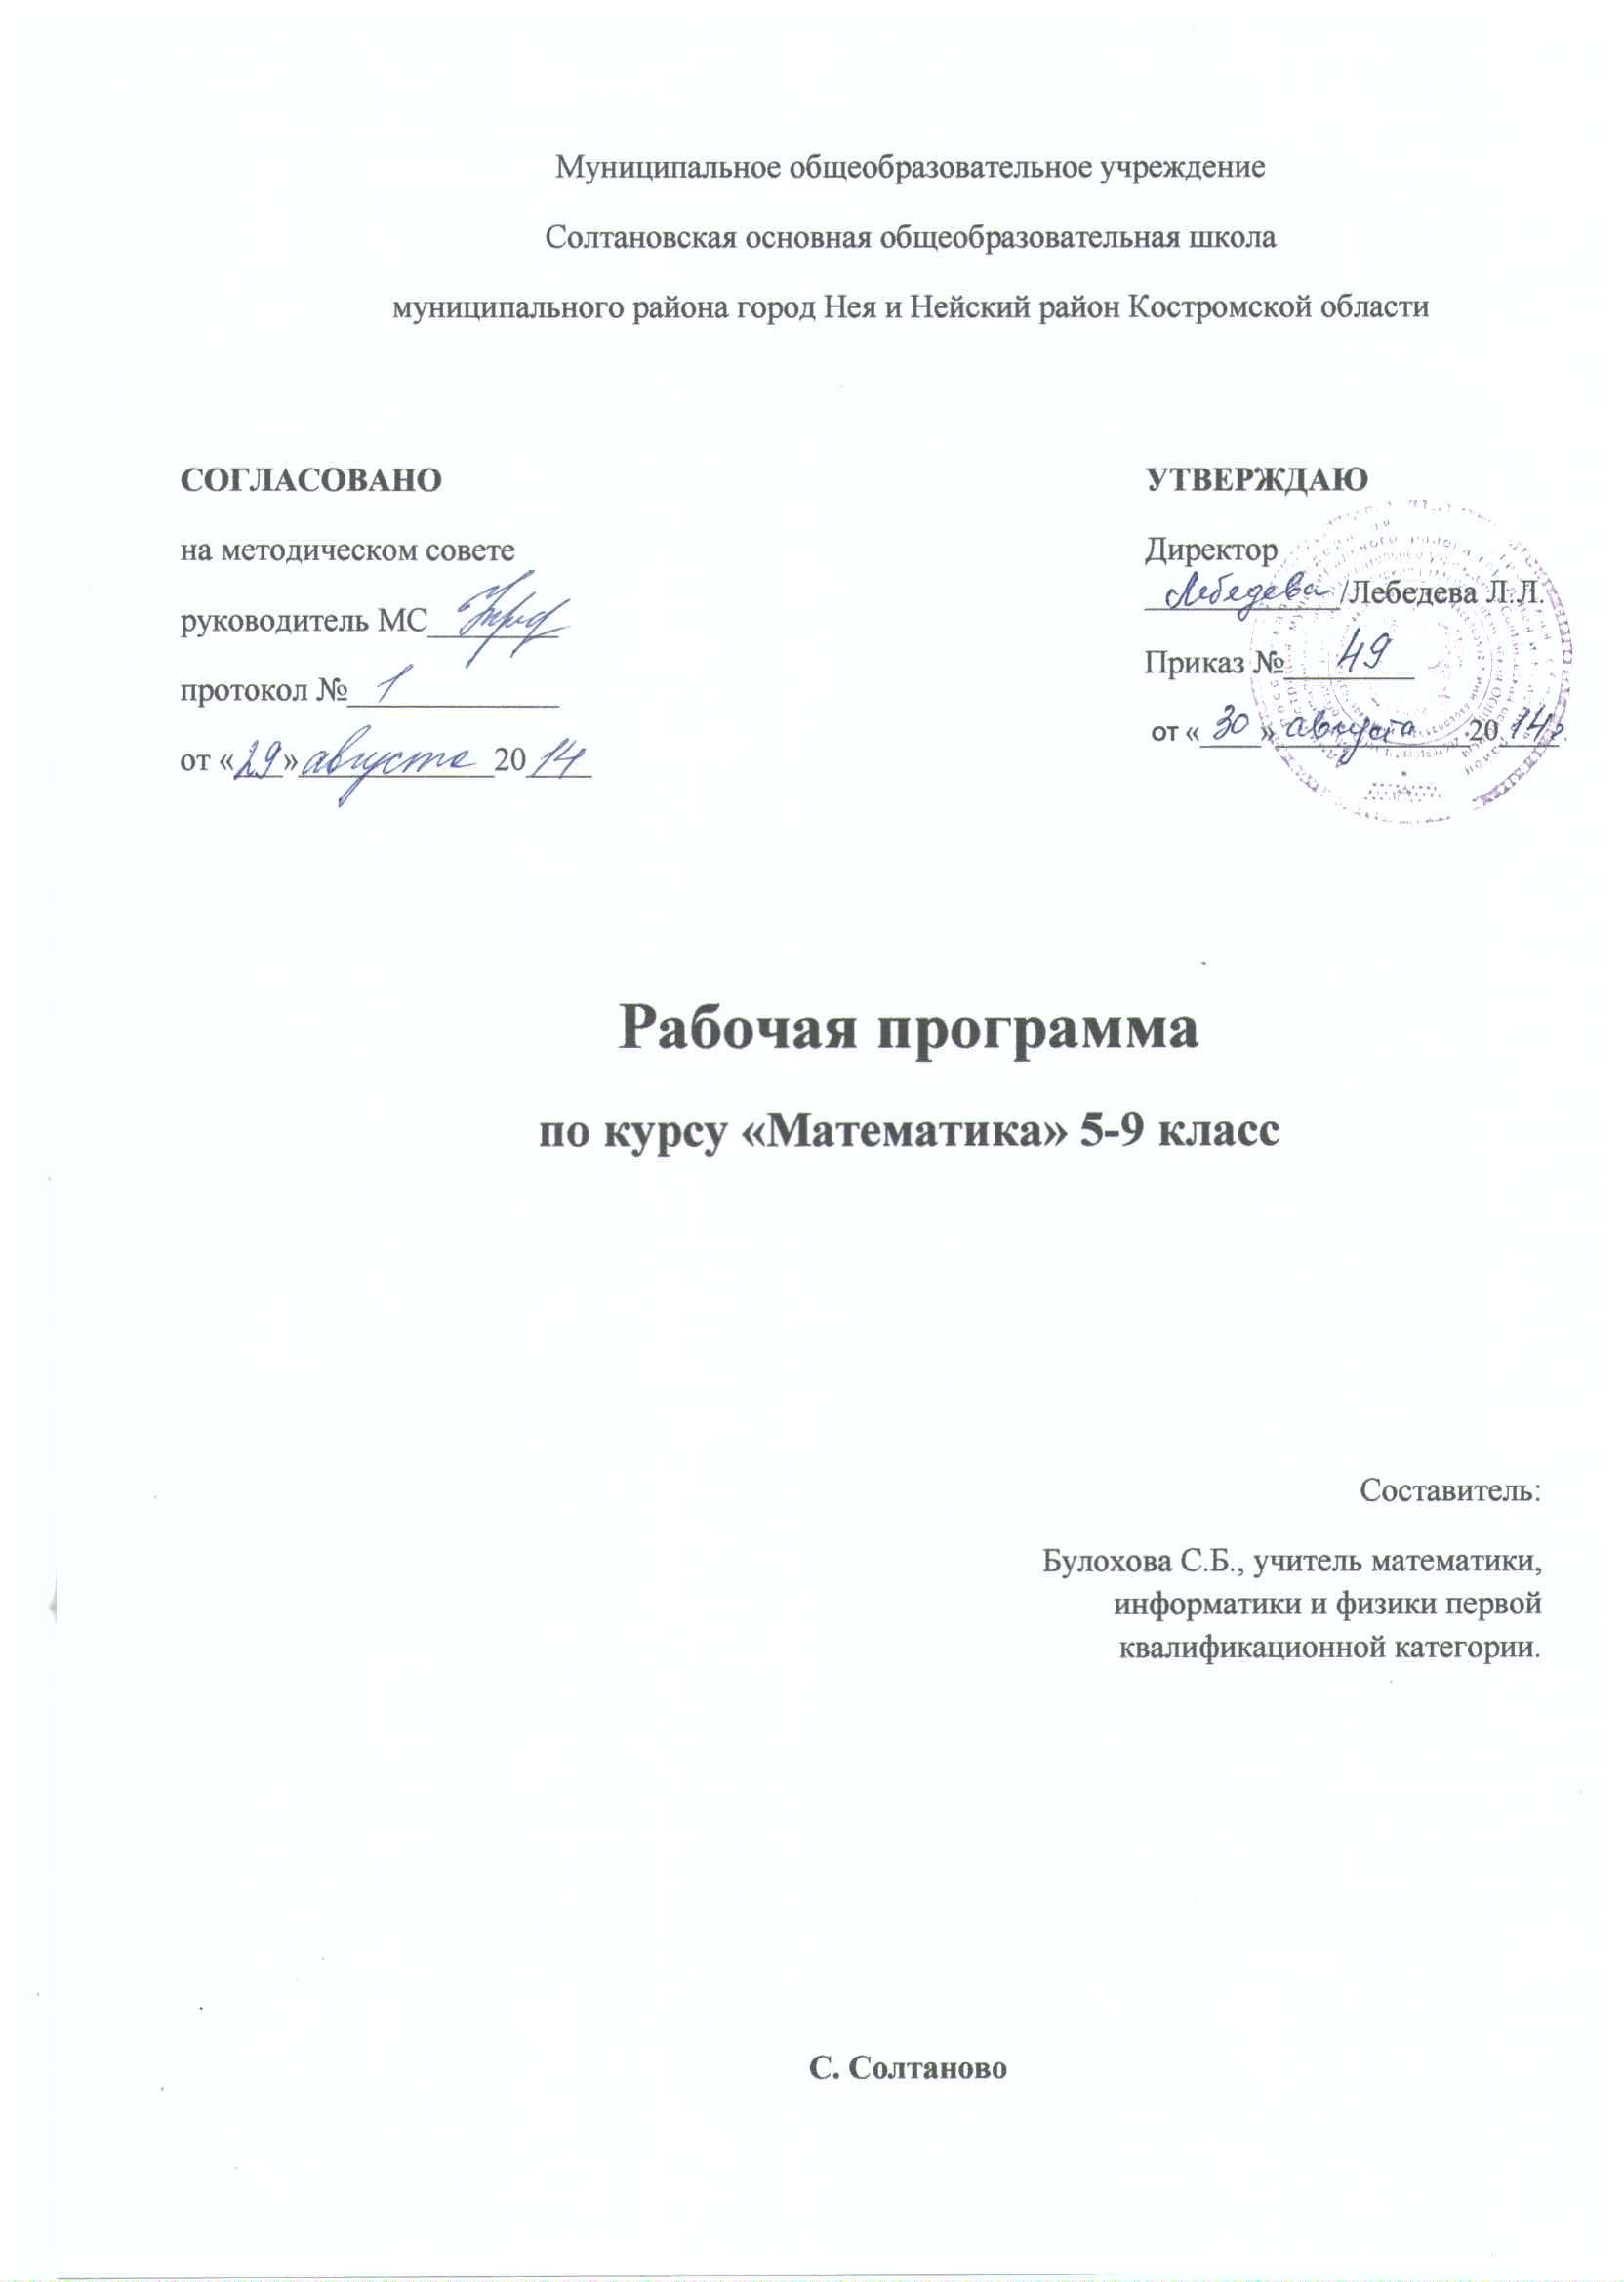 C:\Users\Comp\Desktop\электронное портфолио Булохова Светлана Борисовна\28194521\img-28194521-003.jpg